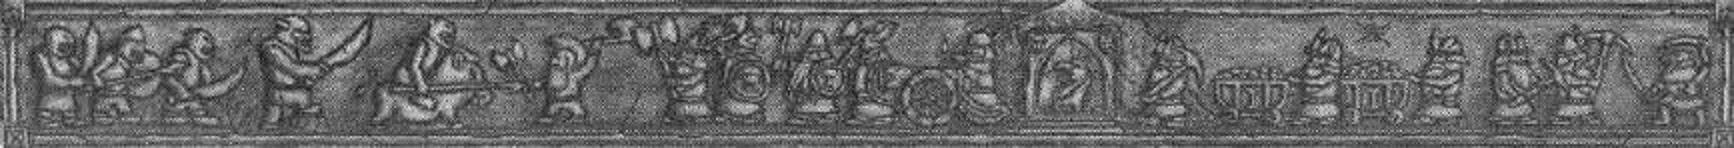 1926-286376e4.jpg